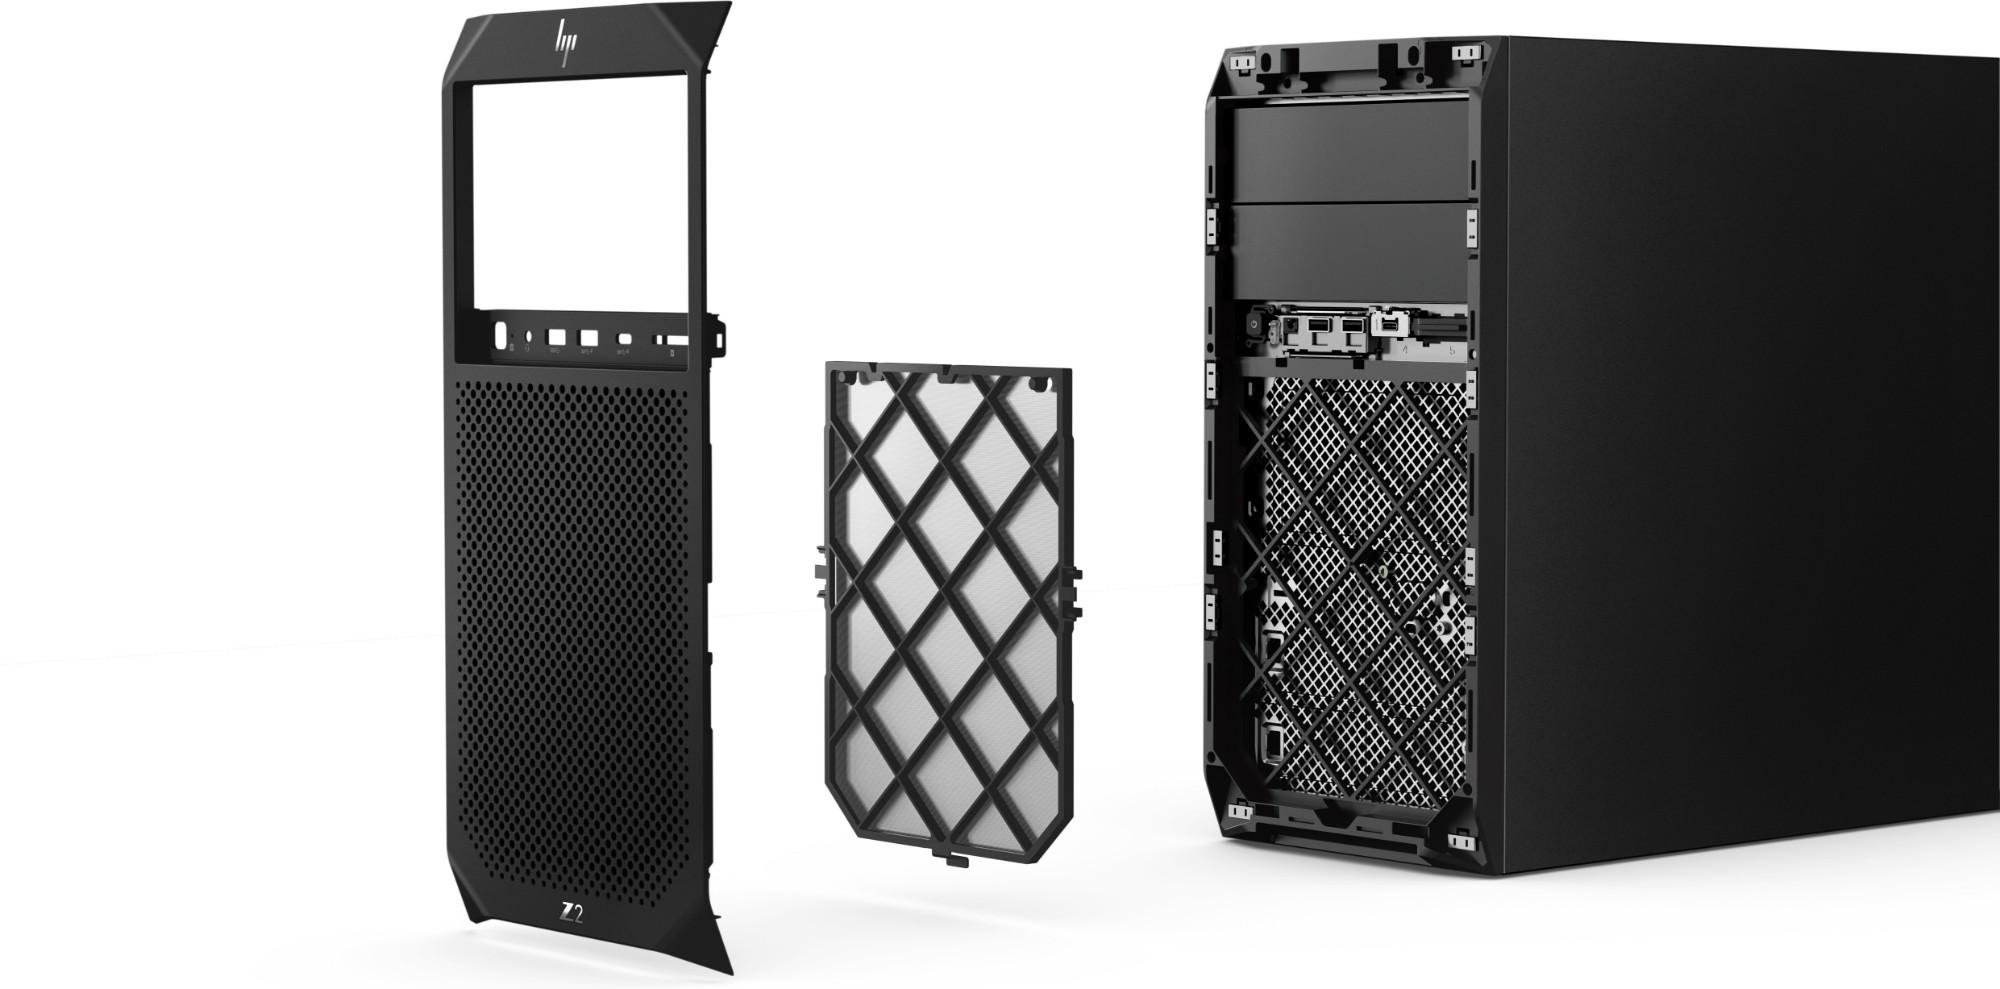 HP 3TQ24AA computer case part Full Tower Dust filter